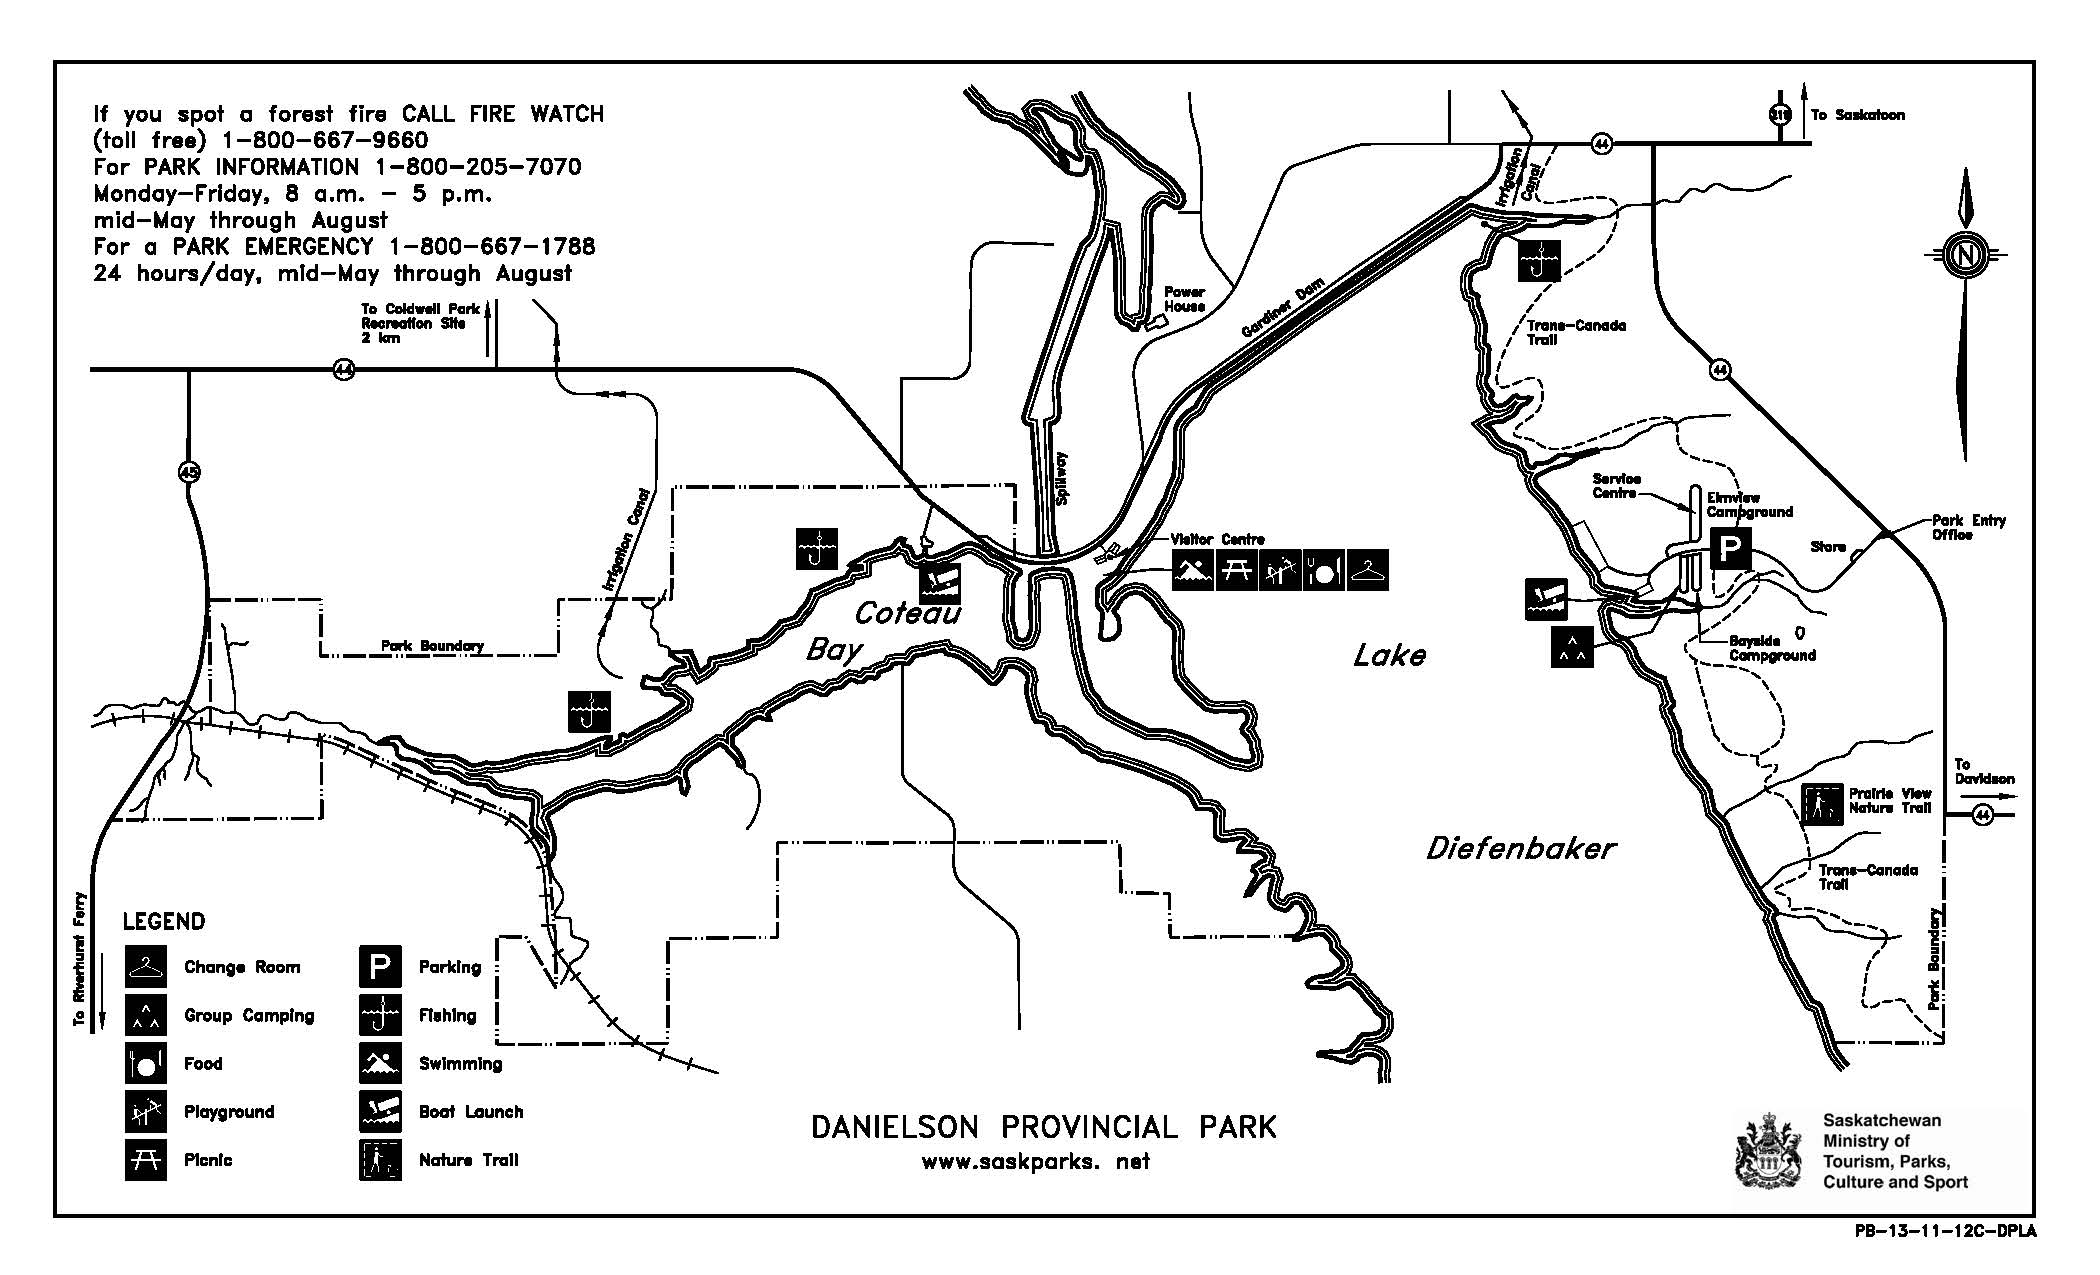 danielson park map